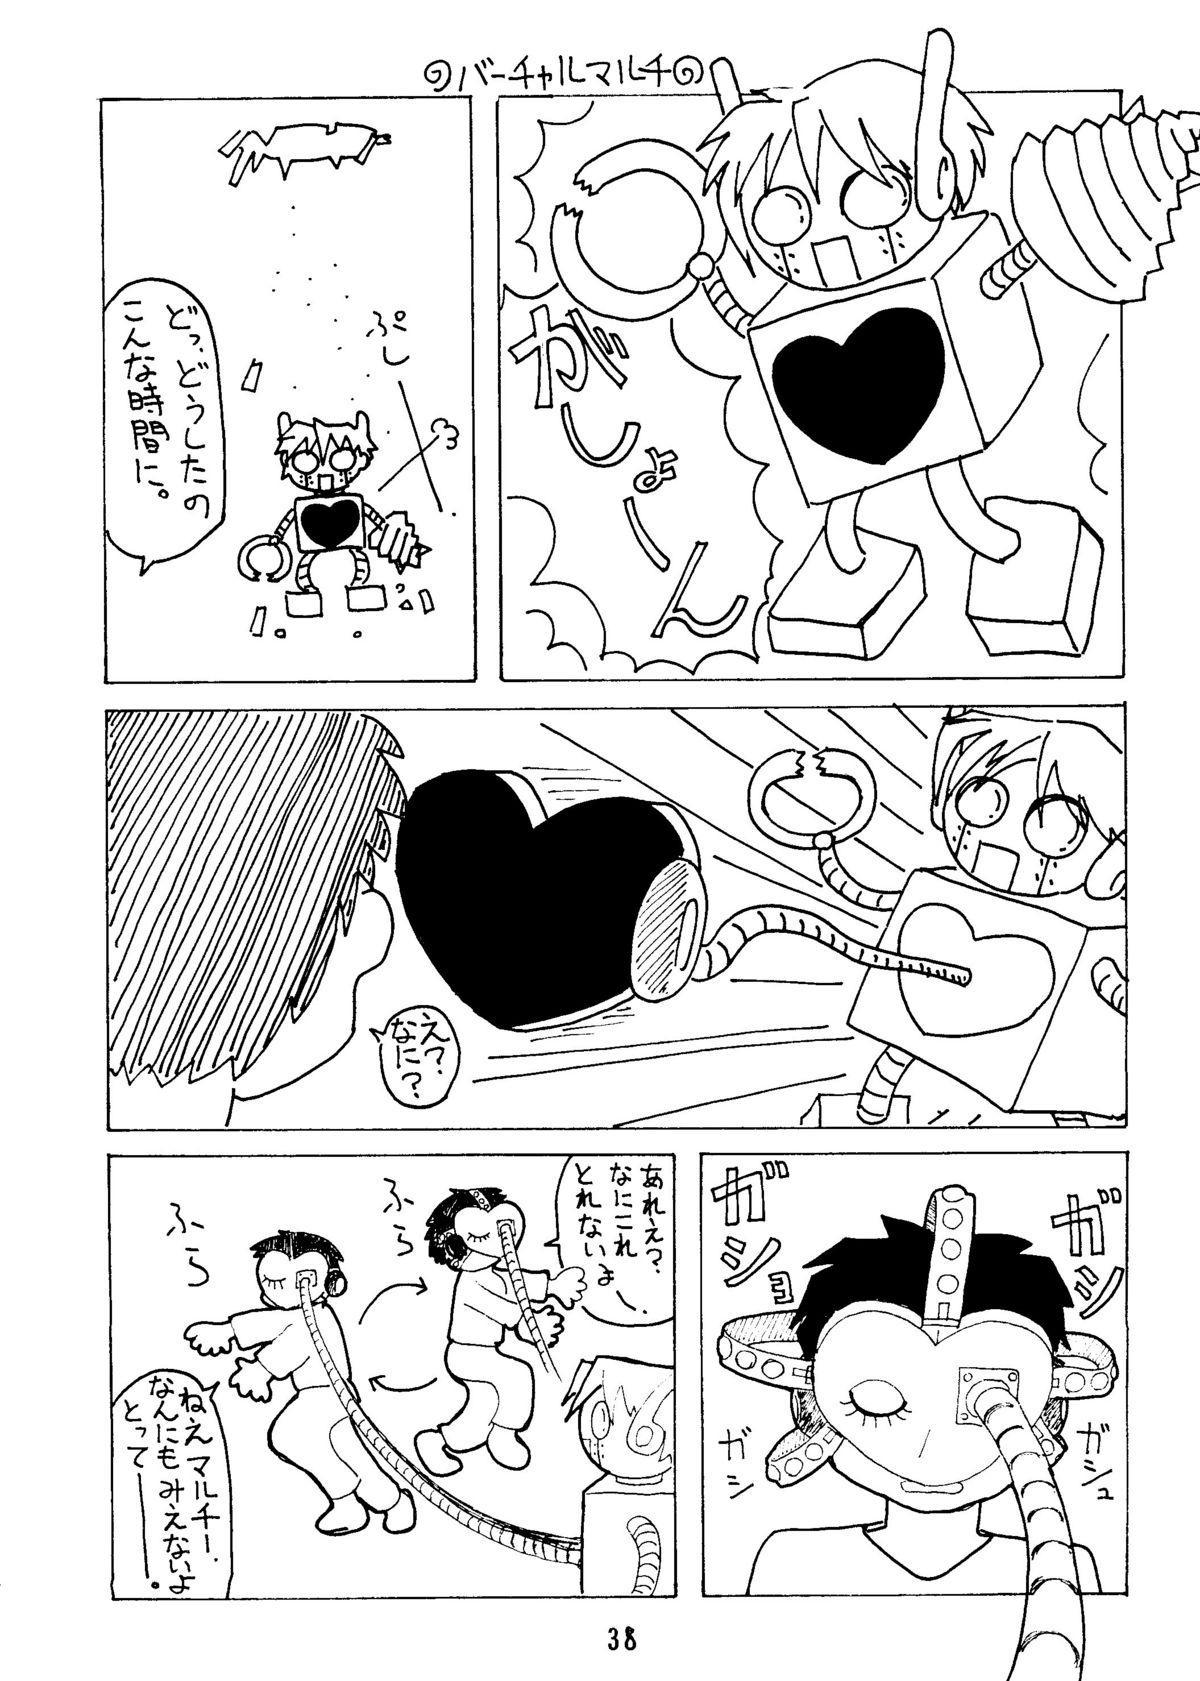 Dandyism 4 (To Heart, Card Captor Sakura, White Album] 39